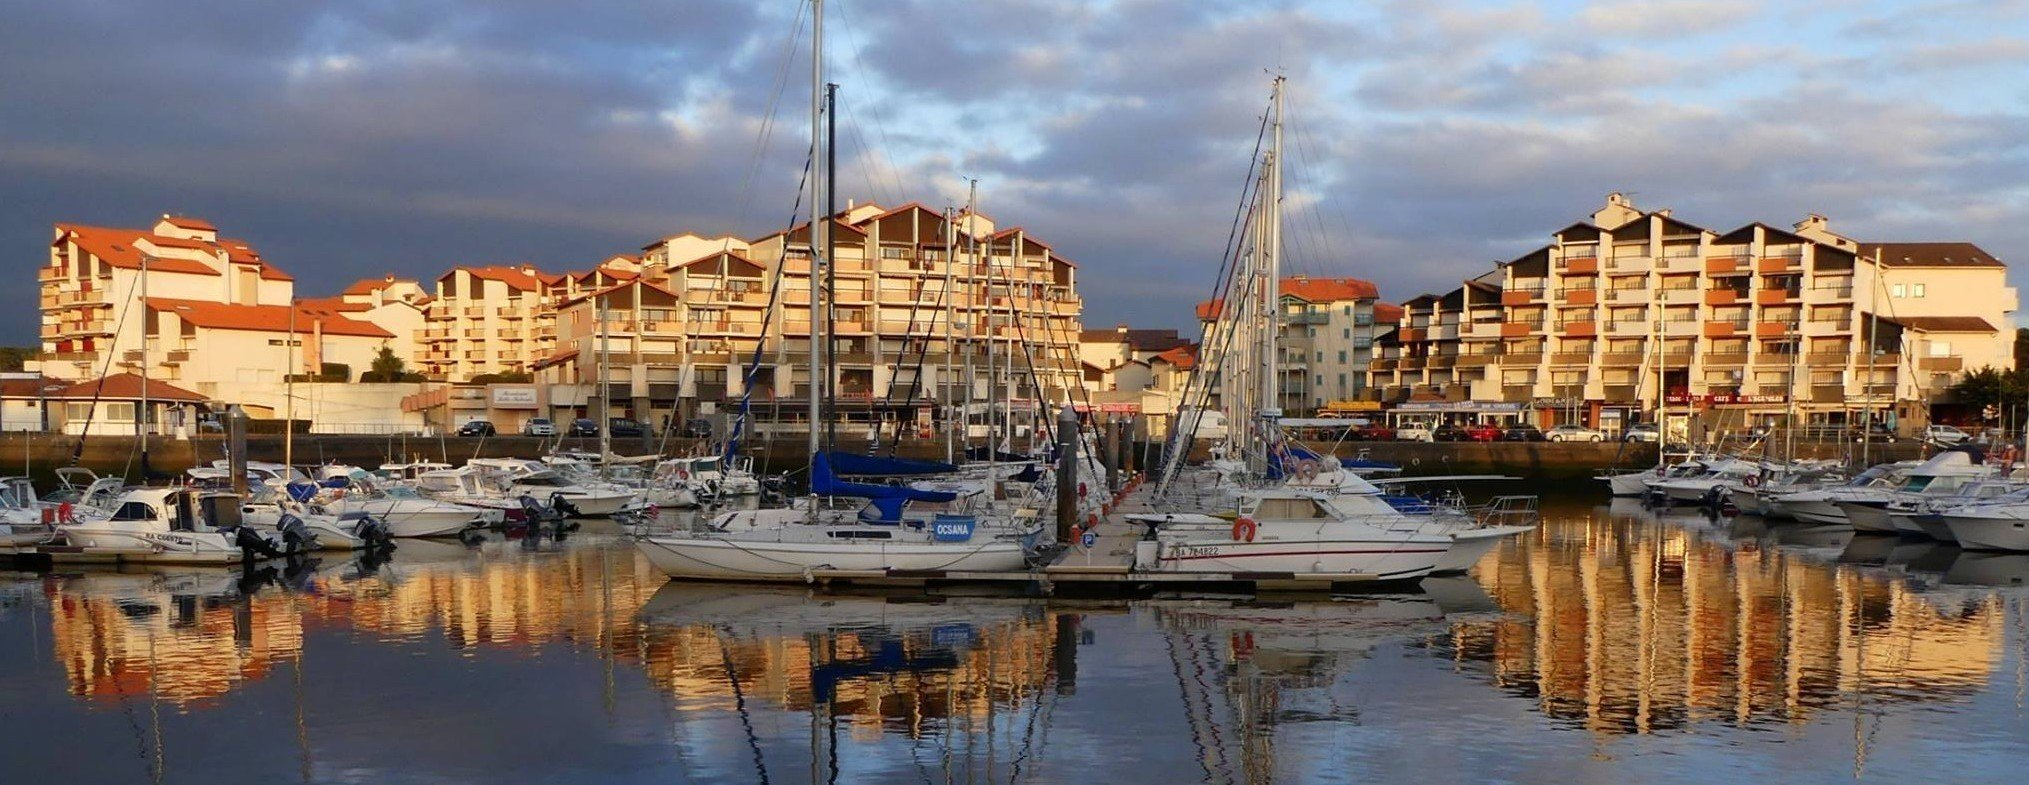 Capbreton, le port